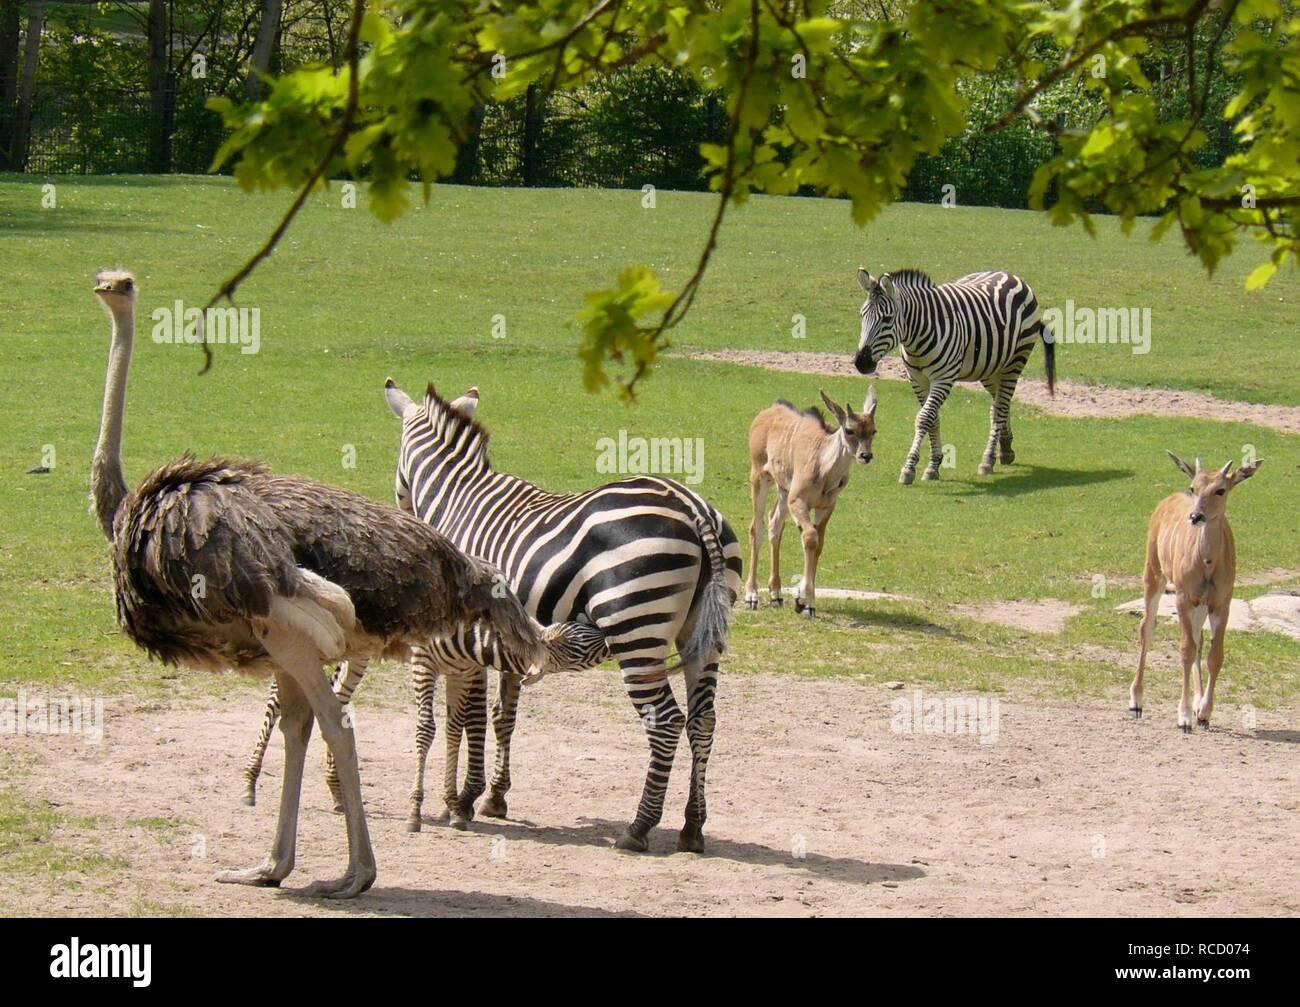 Afrika-Savanne Tiergarten Nürnberg. - Stock Image